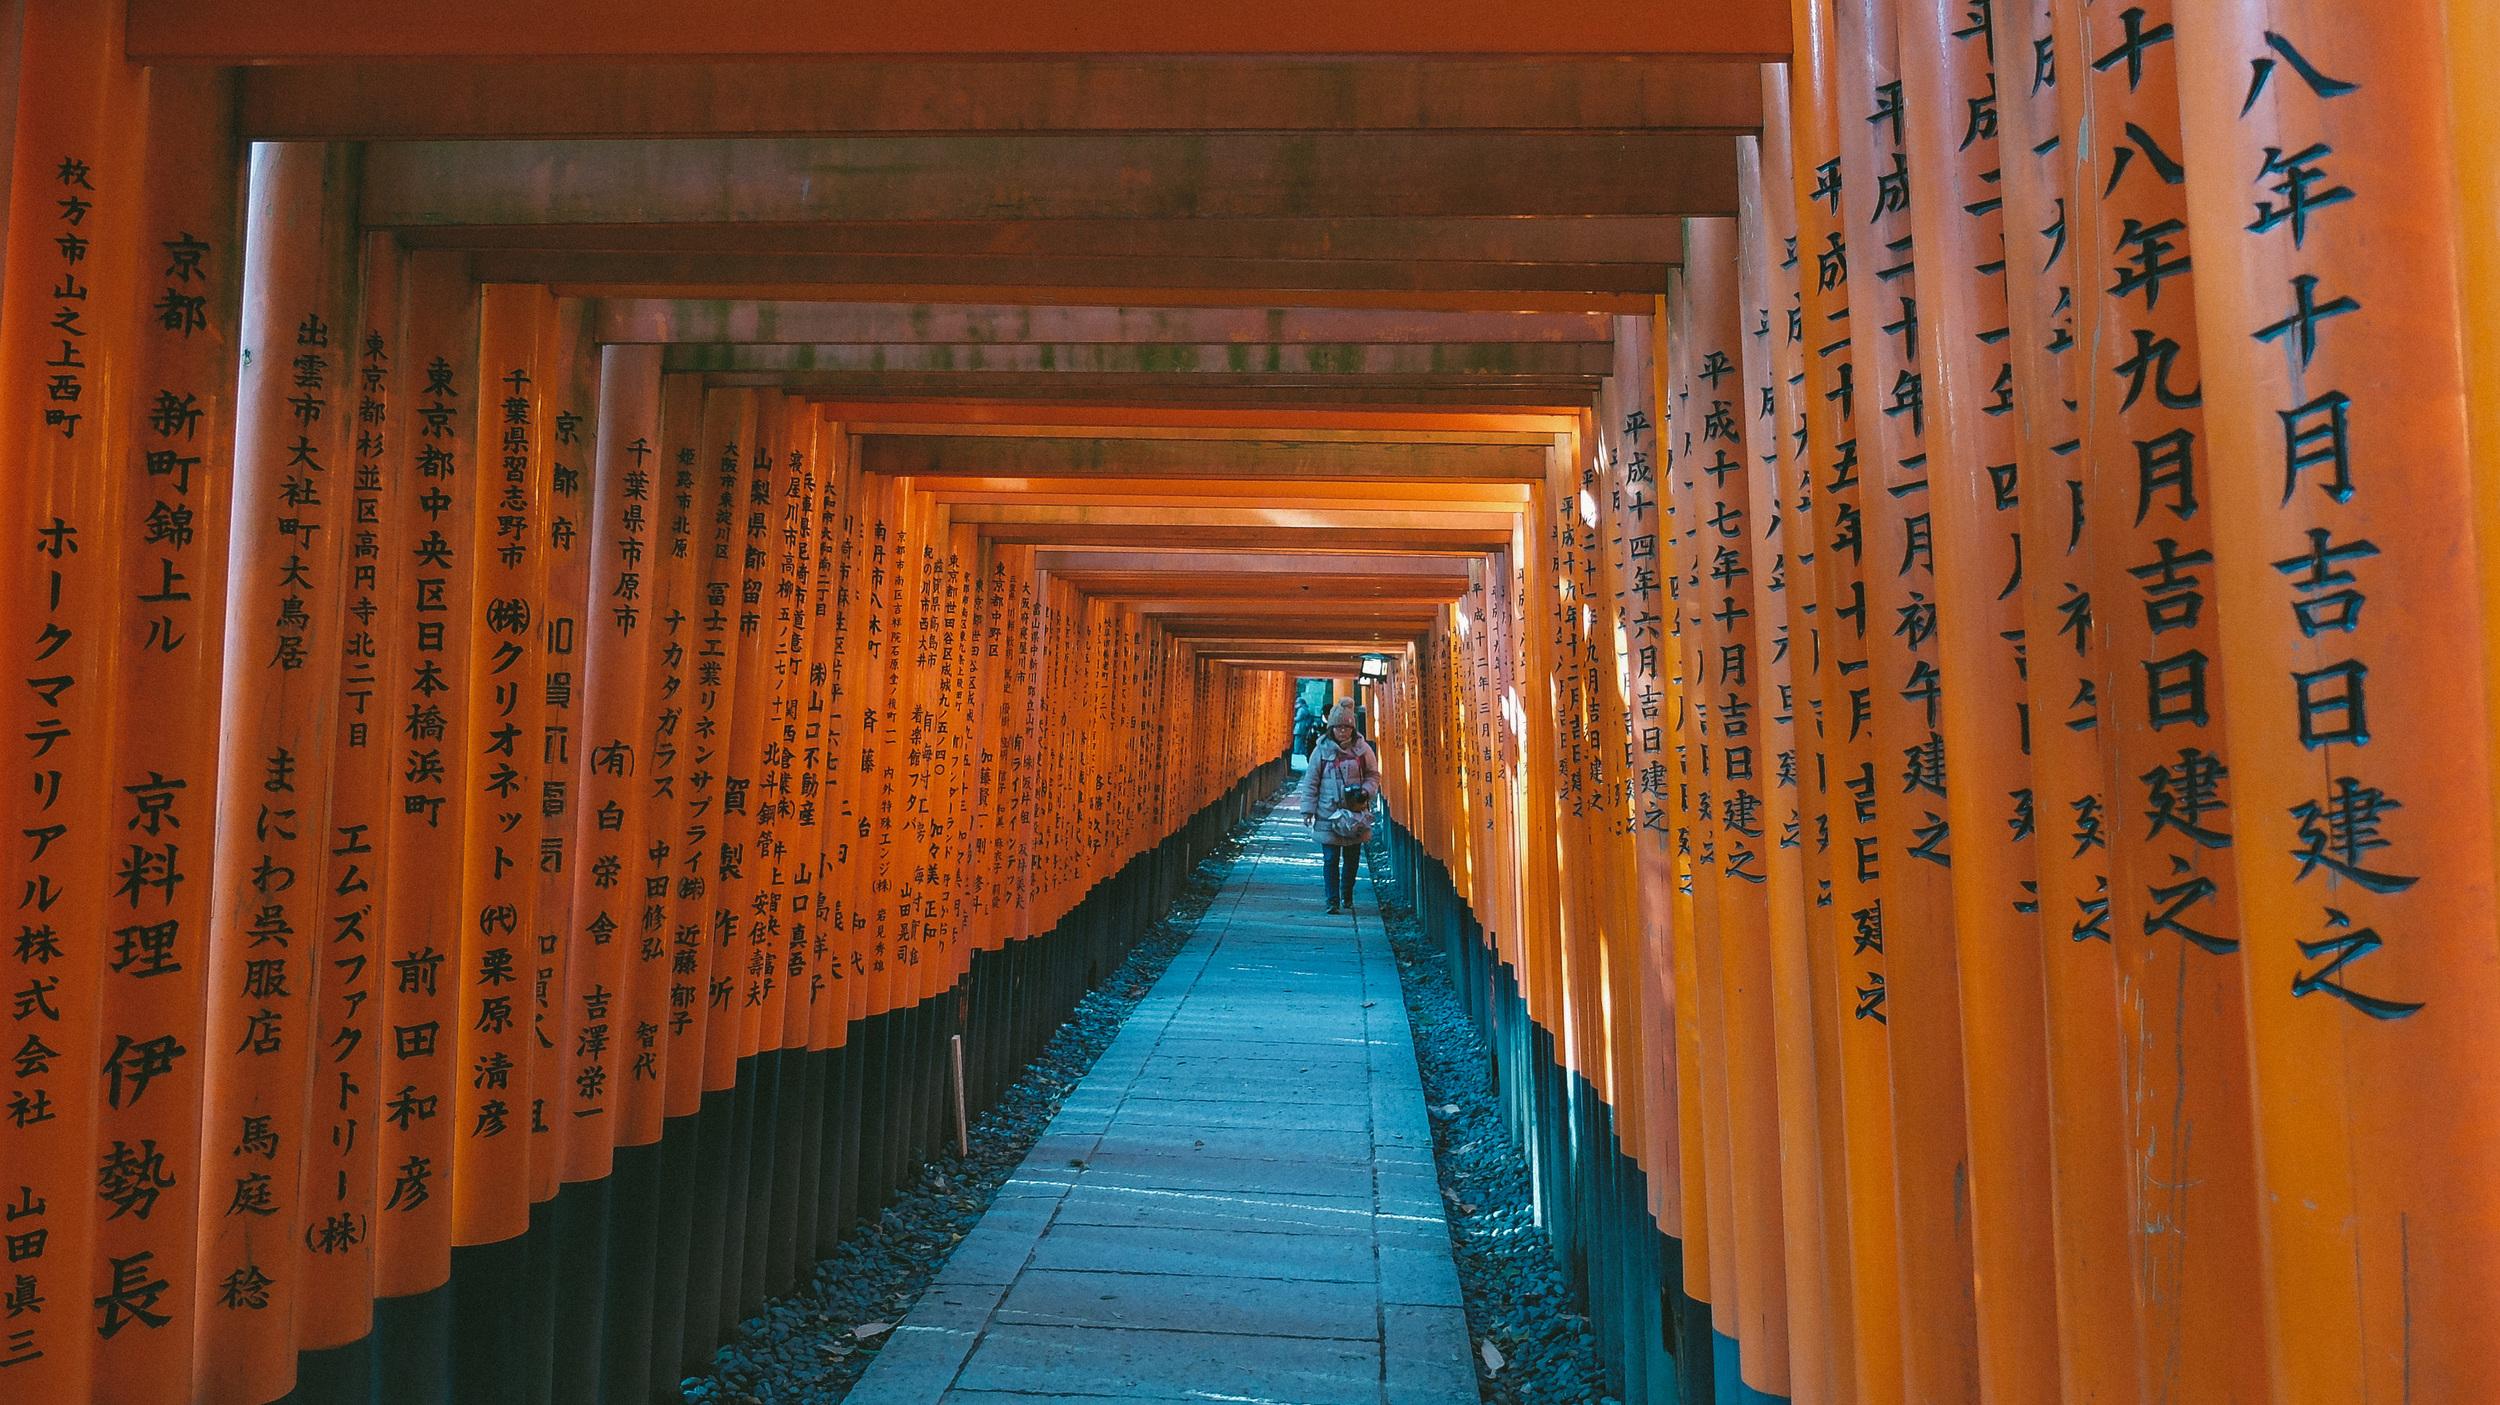 Got the iconic shot at  Fushimi Inari Taisha Shrine    Cost: Free